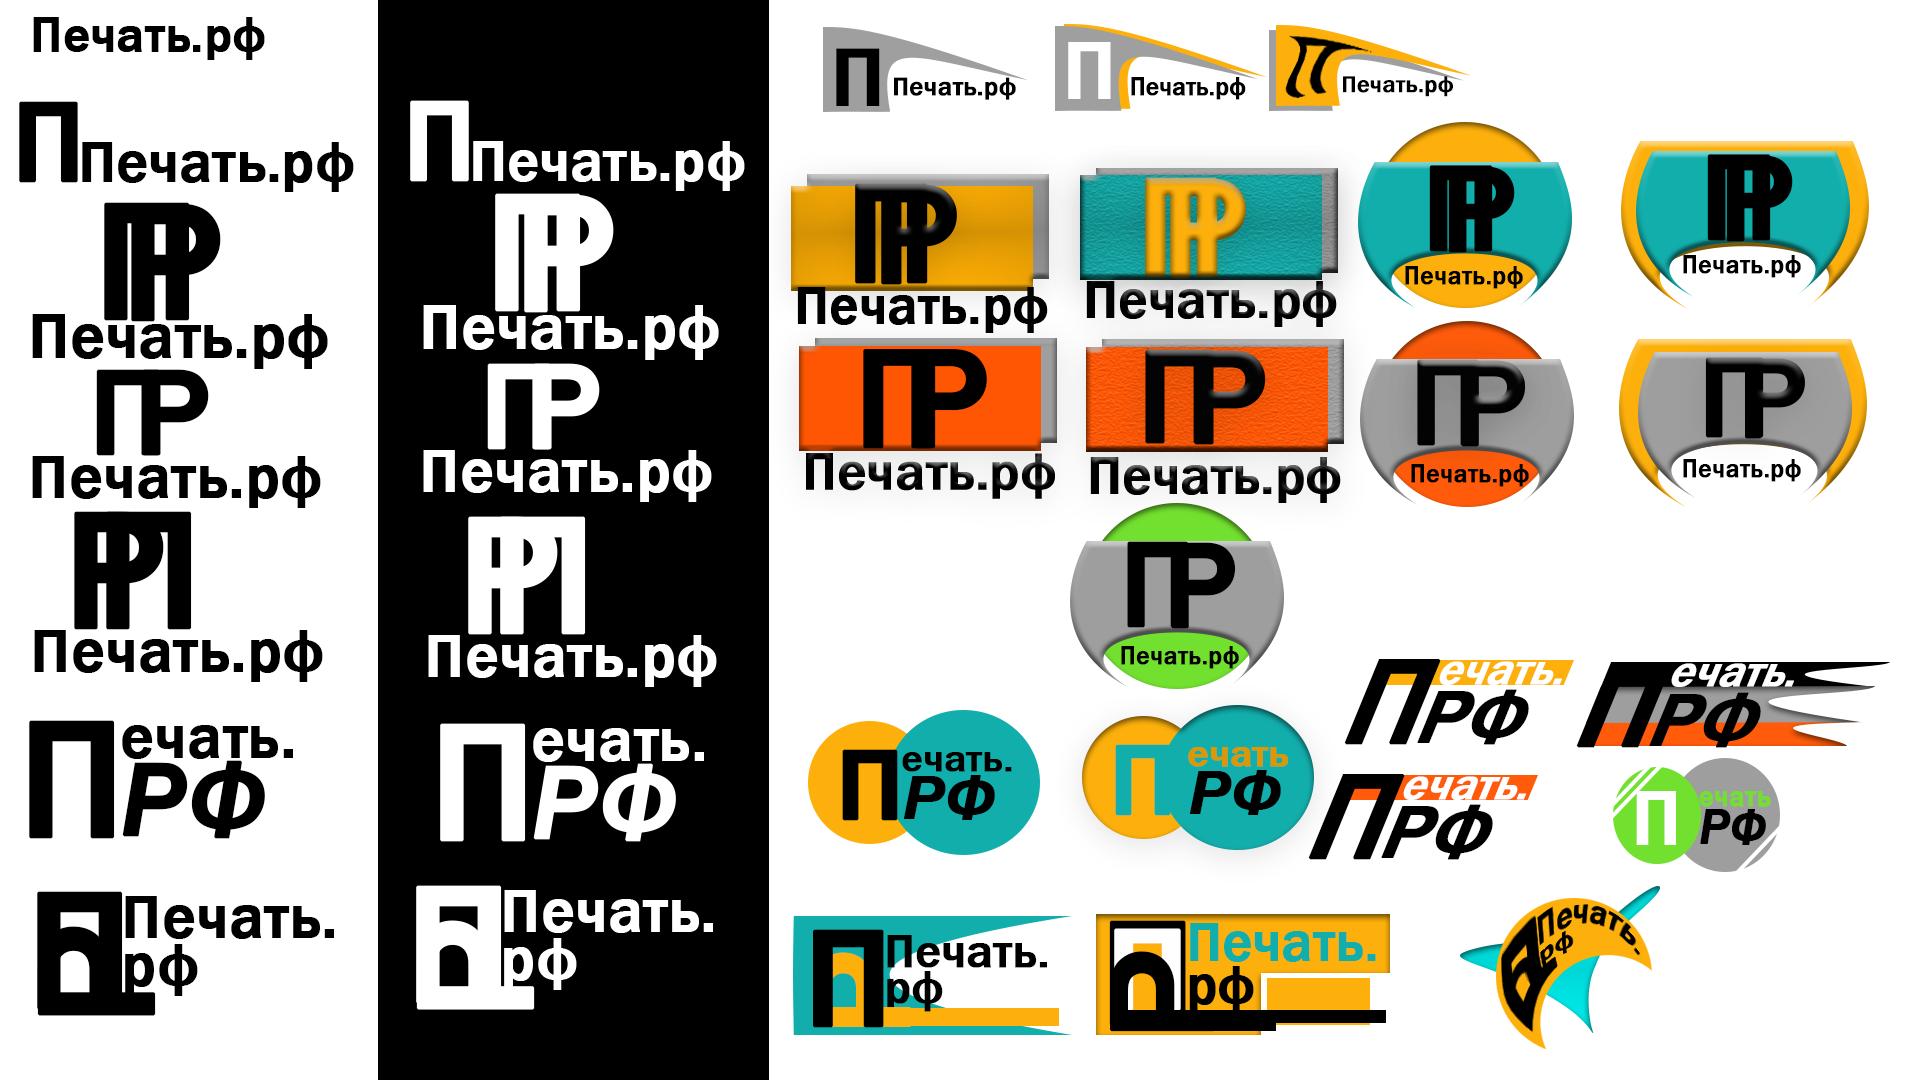 Логотип для веб-сервиса интерьерной печати и оперативной пол фото f_9585d2a3a6b0c4bc.png